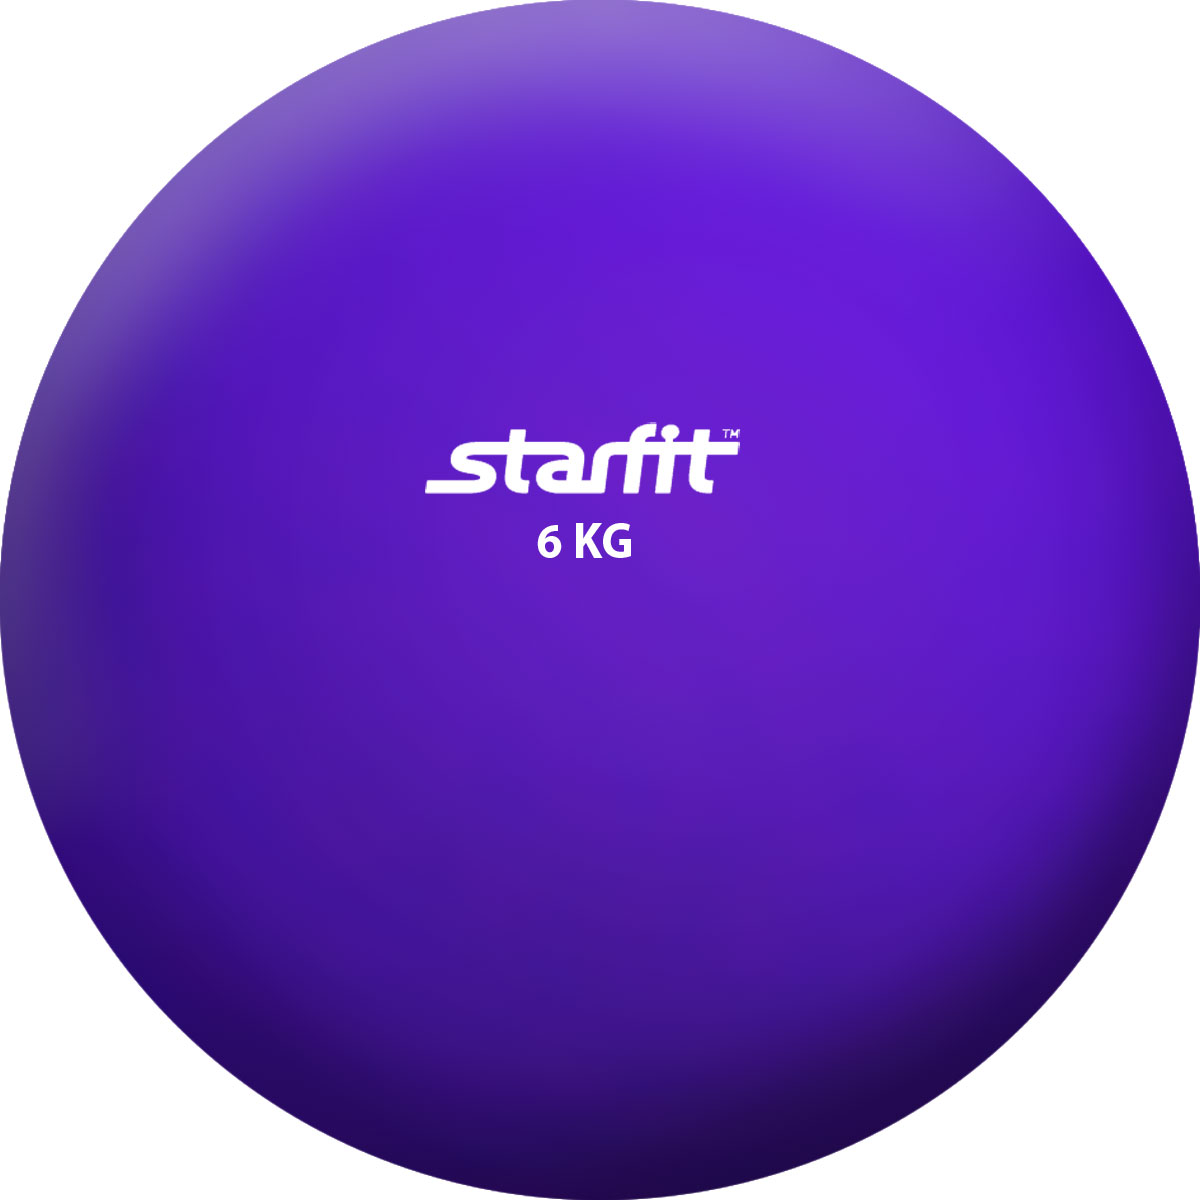 Медбол STARFIT GB-703, 6 кг, фиолетовый 1/2 цена